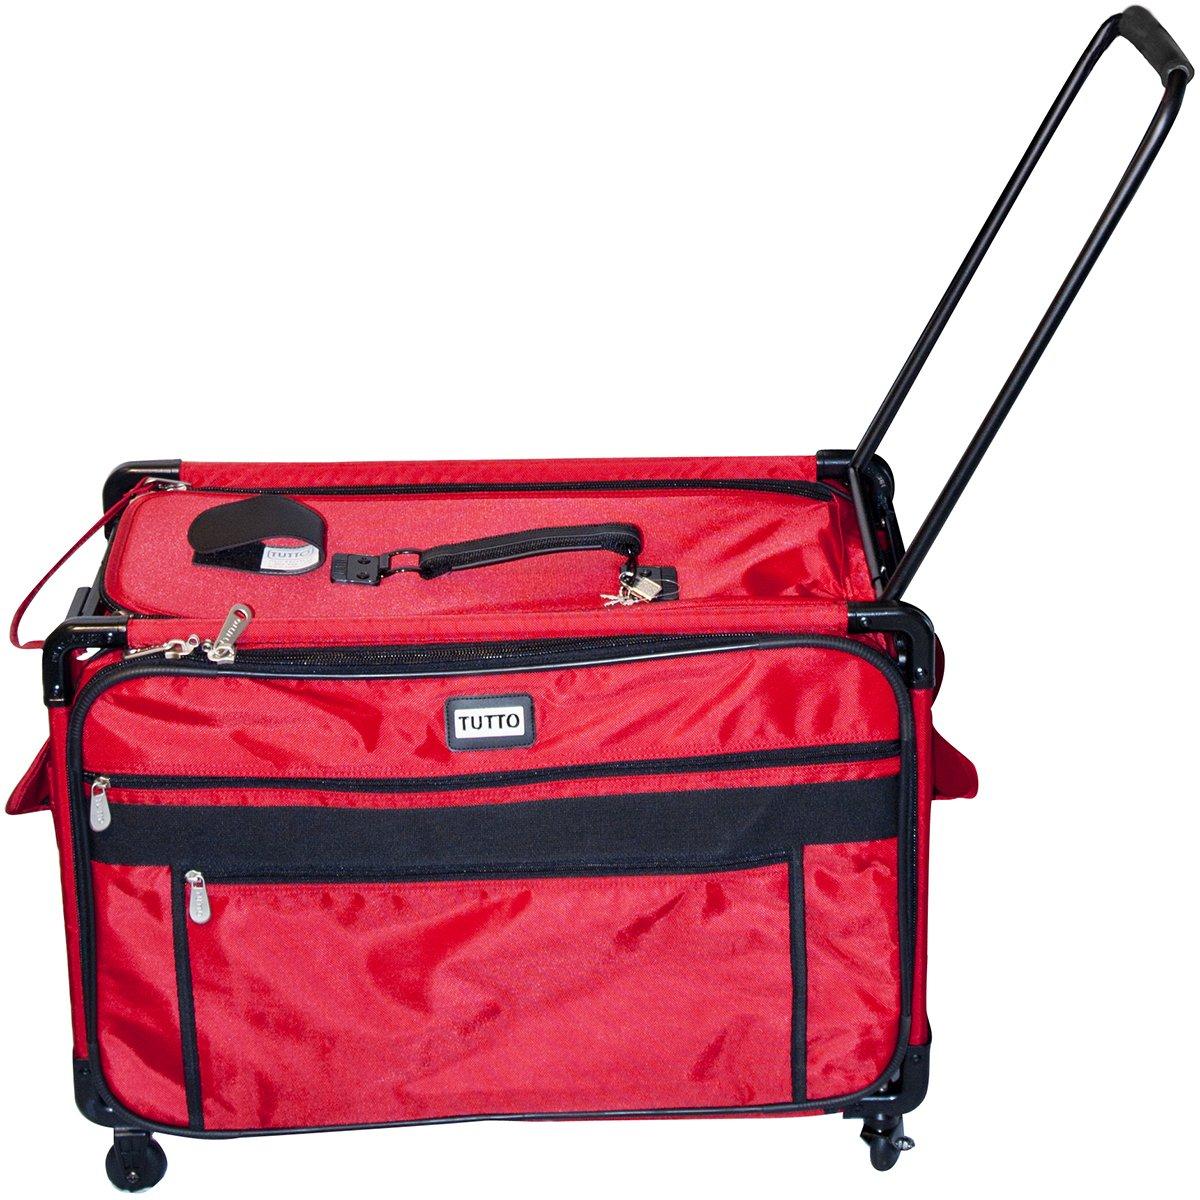 TUTTO Machine On Wheels Case, 27''X16.25''X14'' Red by Tutto